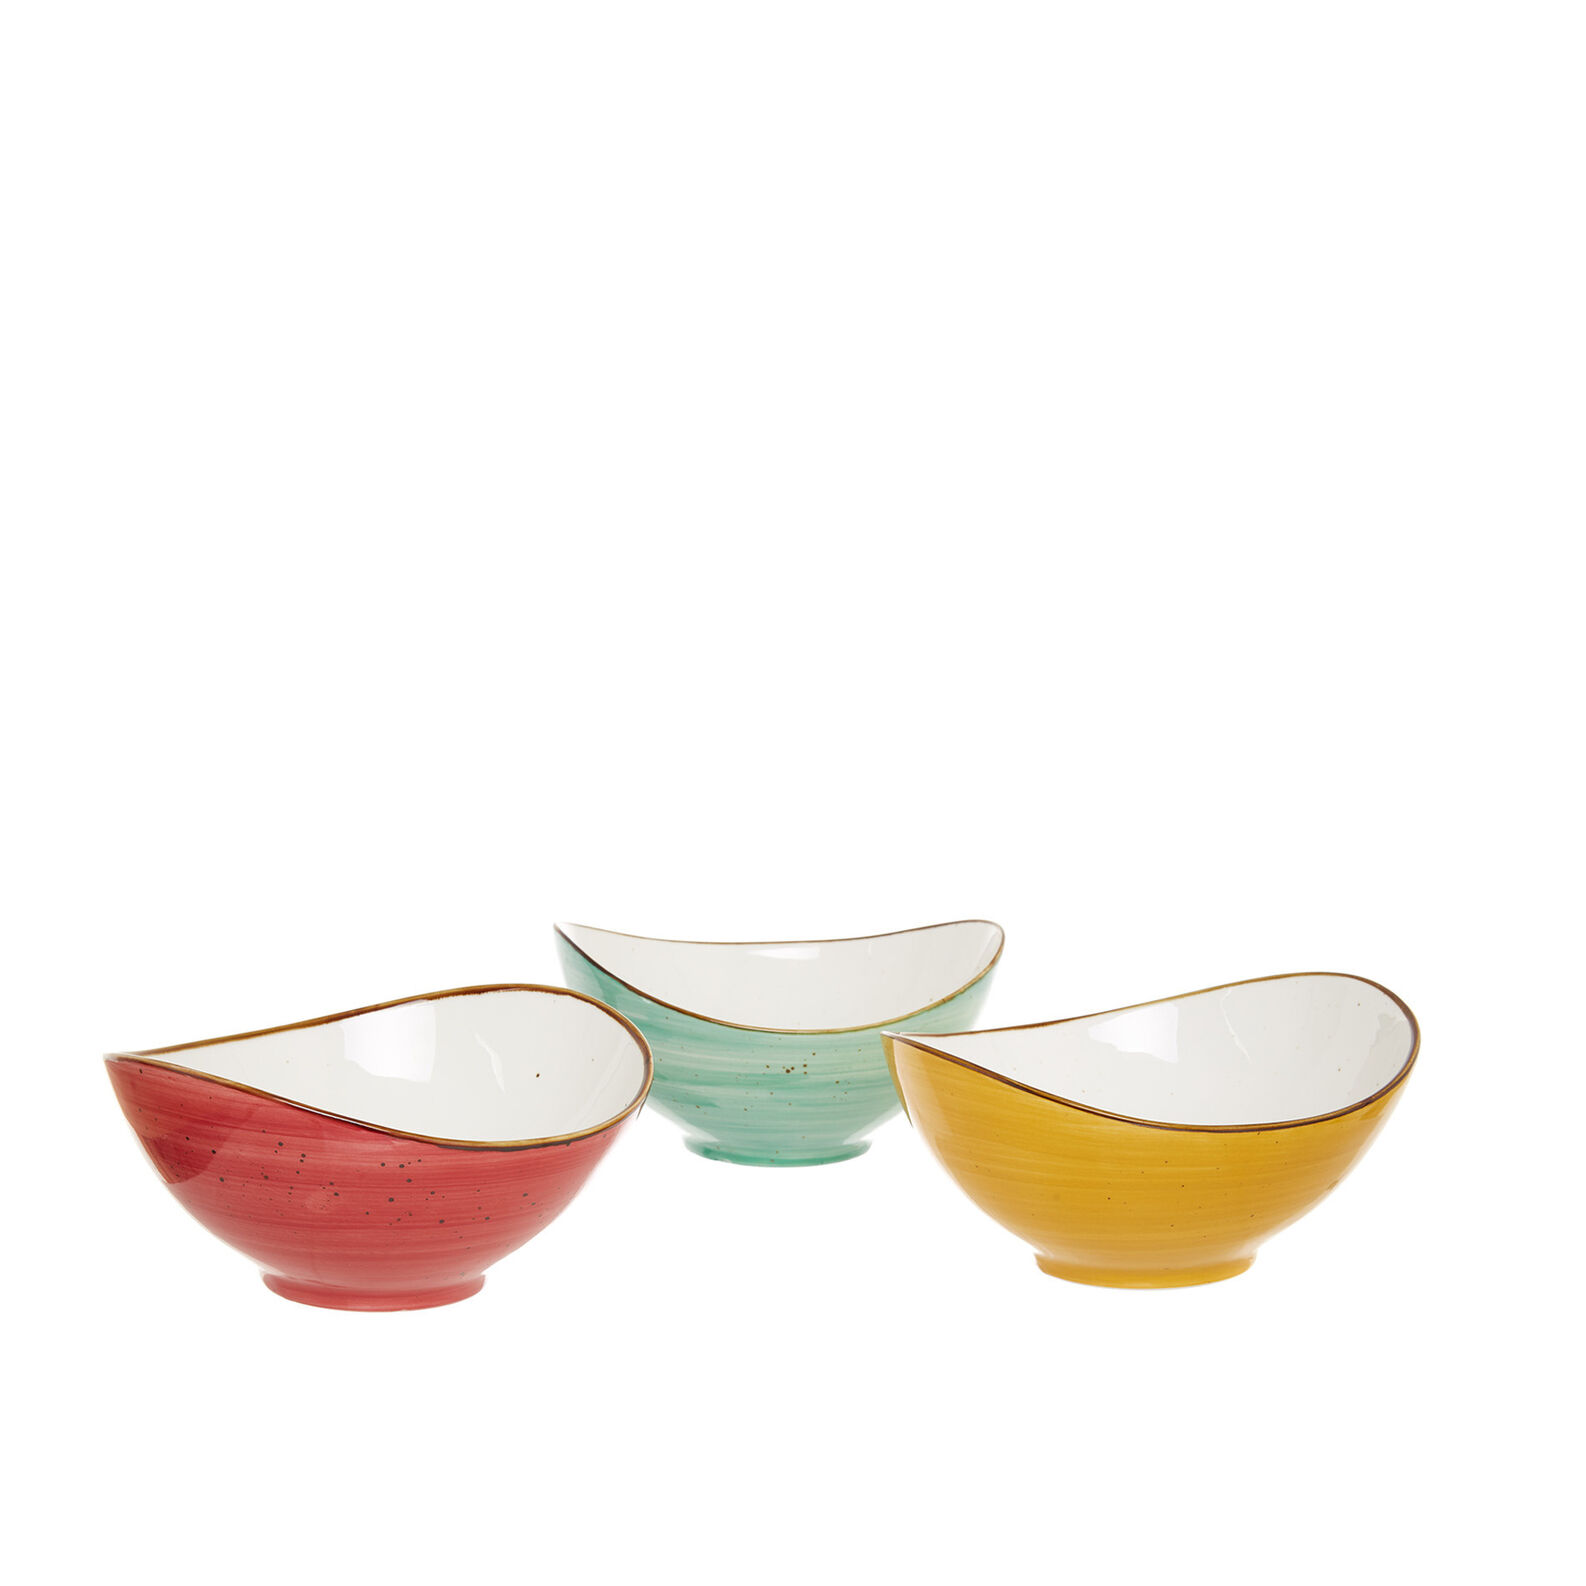 Oval bowl in coloured porcelain